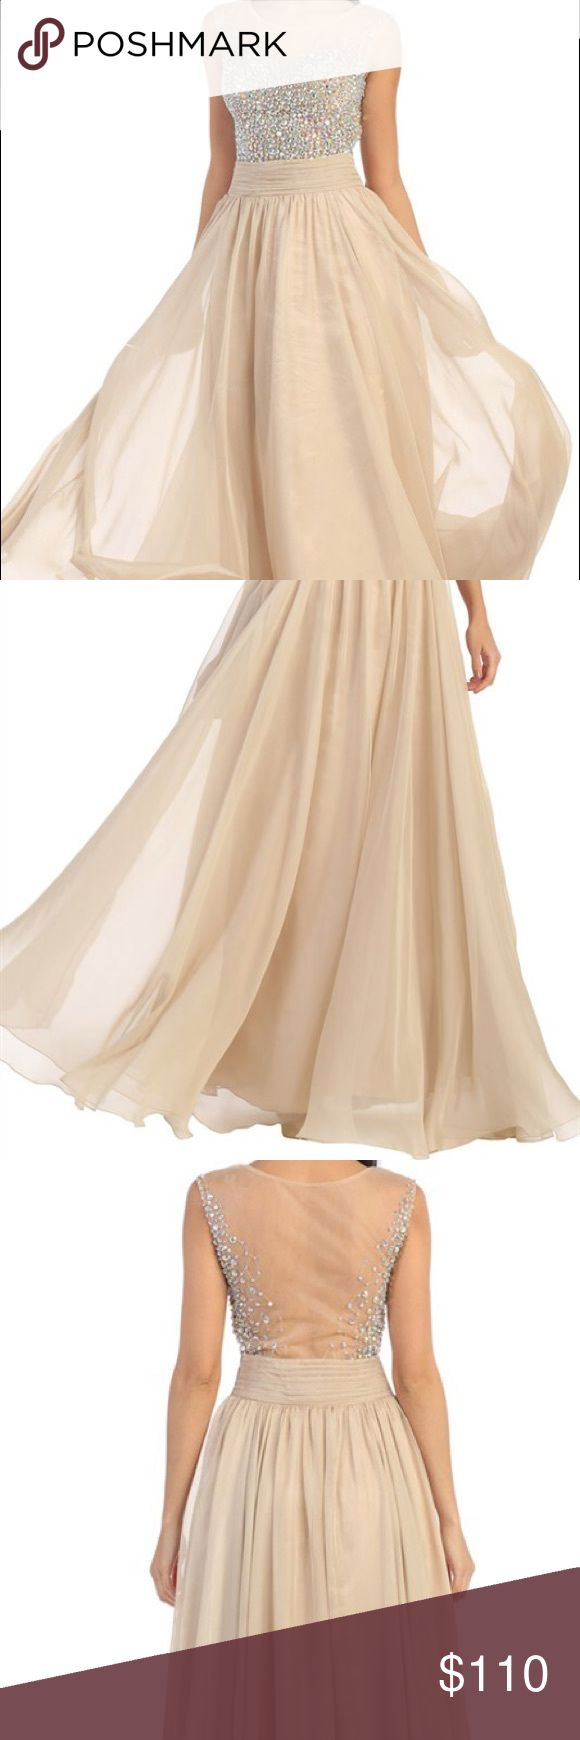 Champagne prom dress Sparkle prom dress Dresses Prom